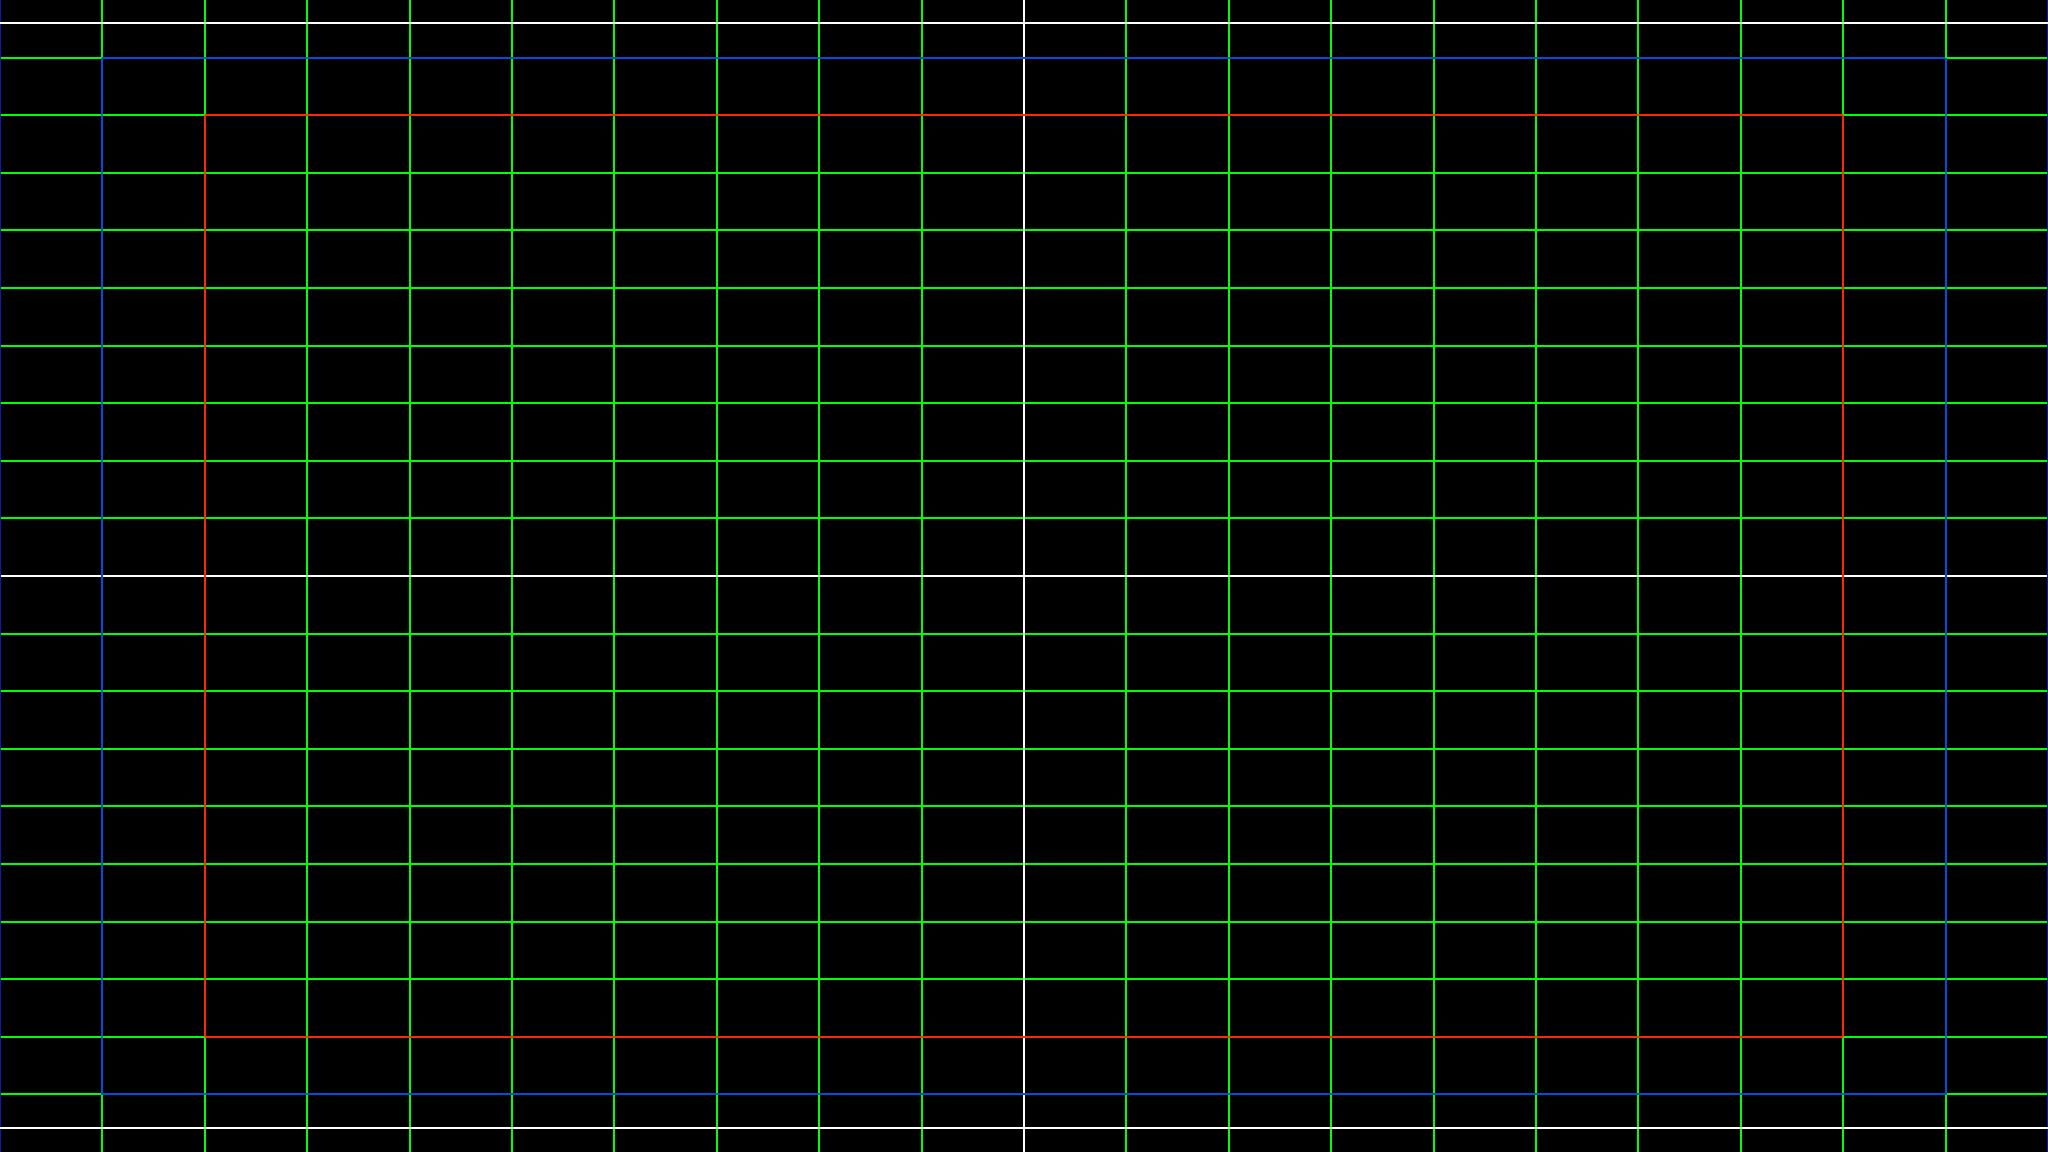 Random Freebies – 2K 1 85 Title Safe Overlays | Final Cut Pro X Babbling